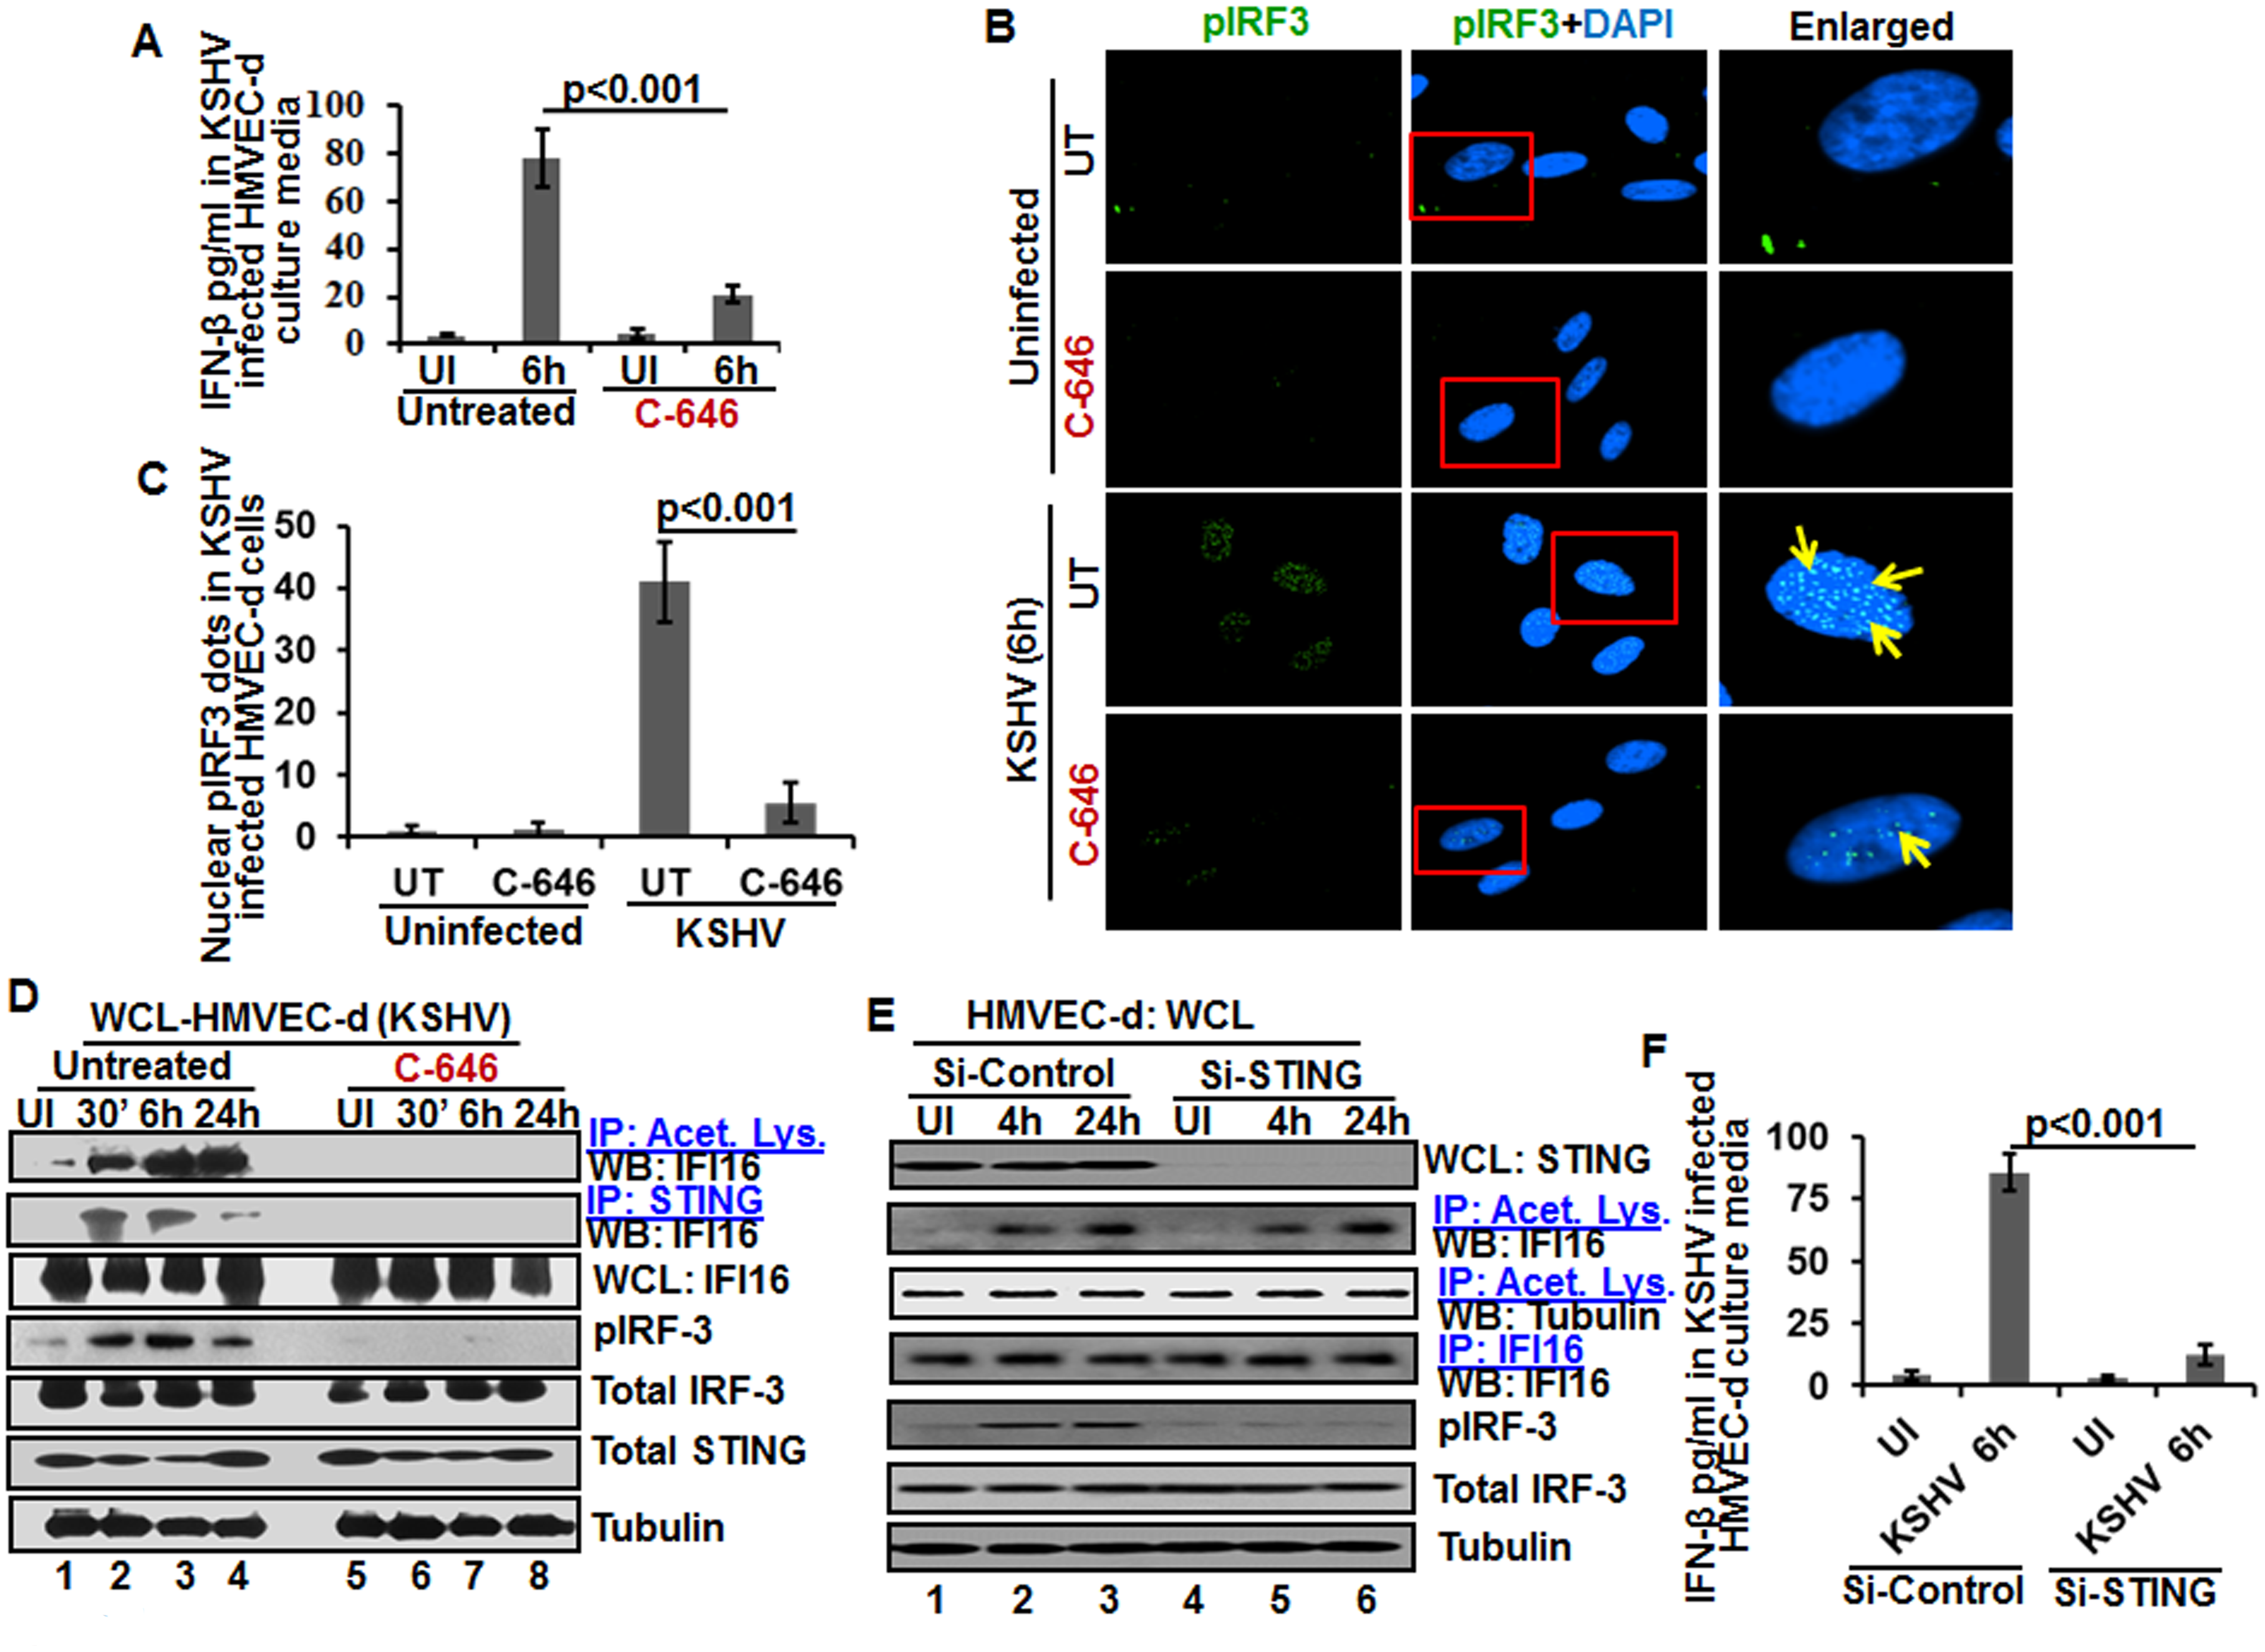 Effect of IFI16 acetylation on IFN-β production during <i>de novo</i> KSHV infection of HMVEC-d cells.